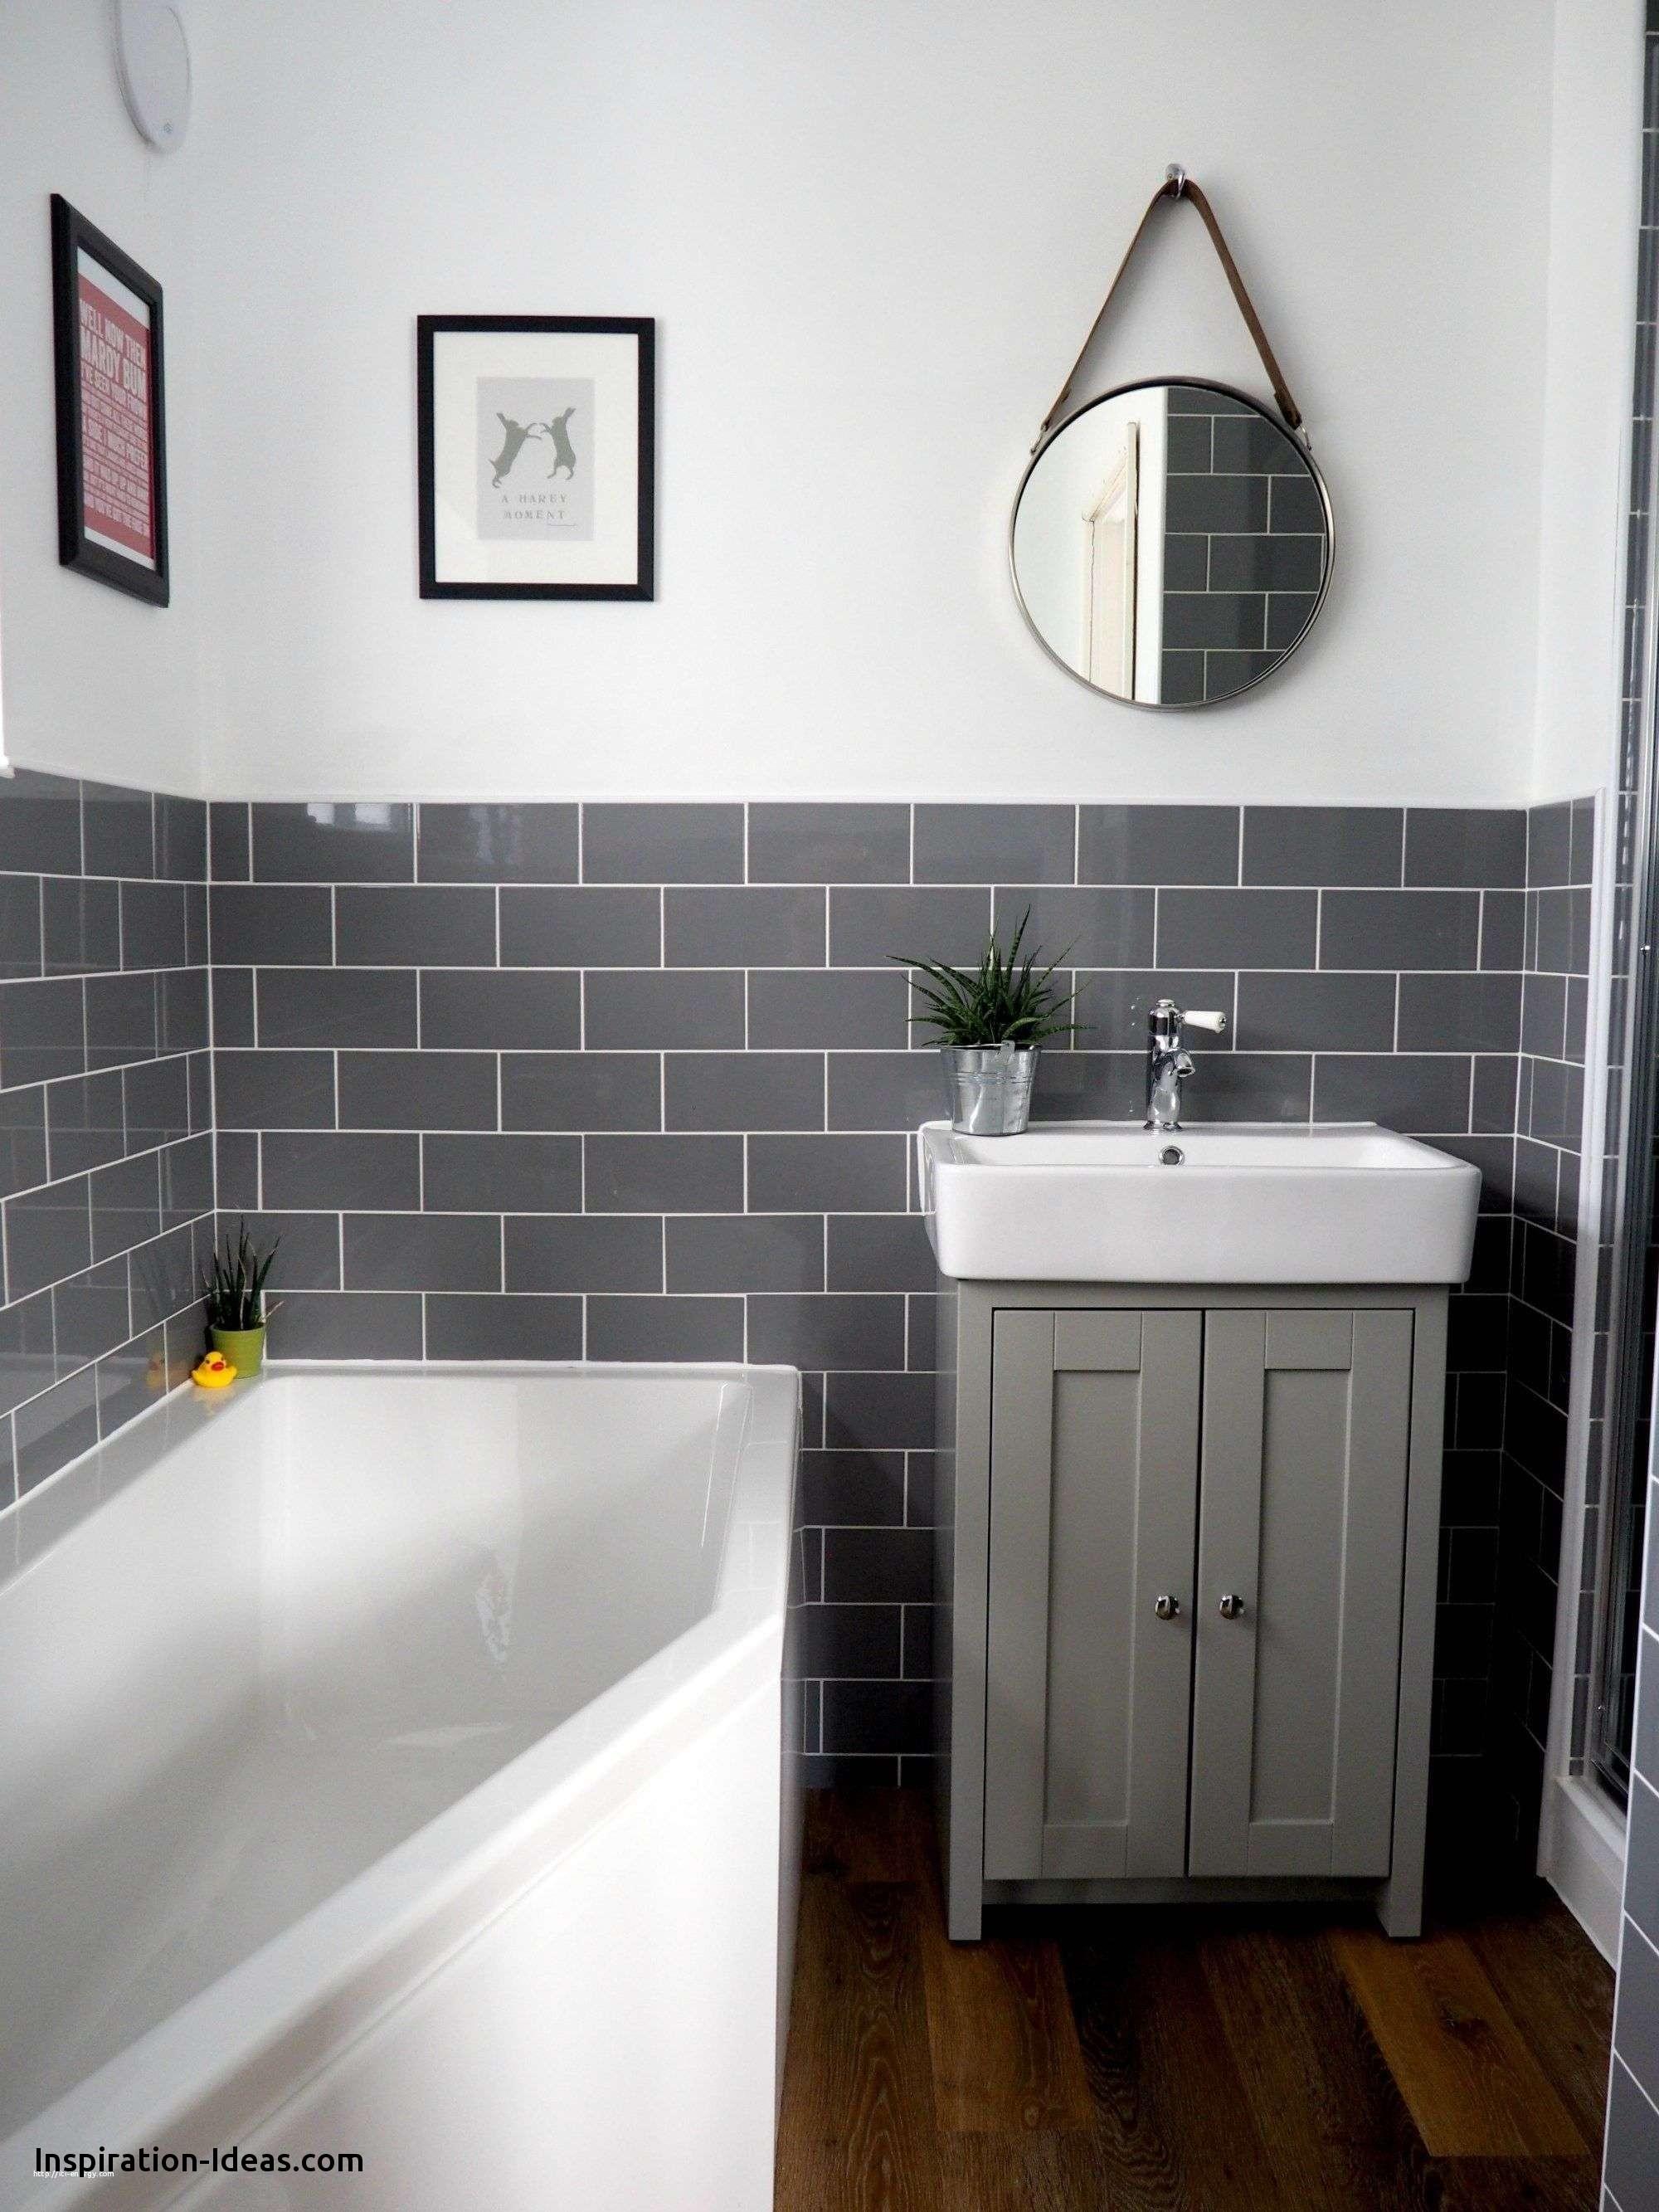 Impressive Handicap Accessible Bathroom Design Ideas Of ...